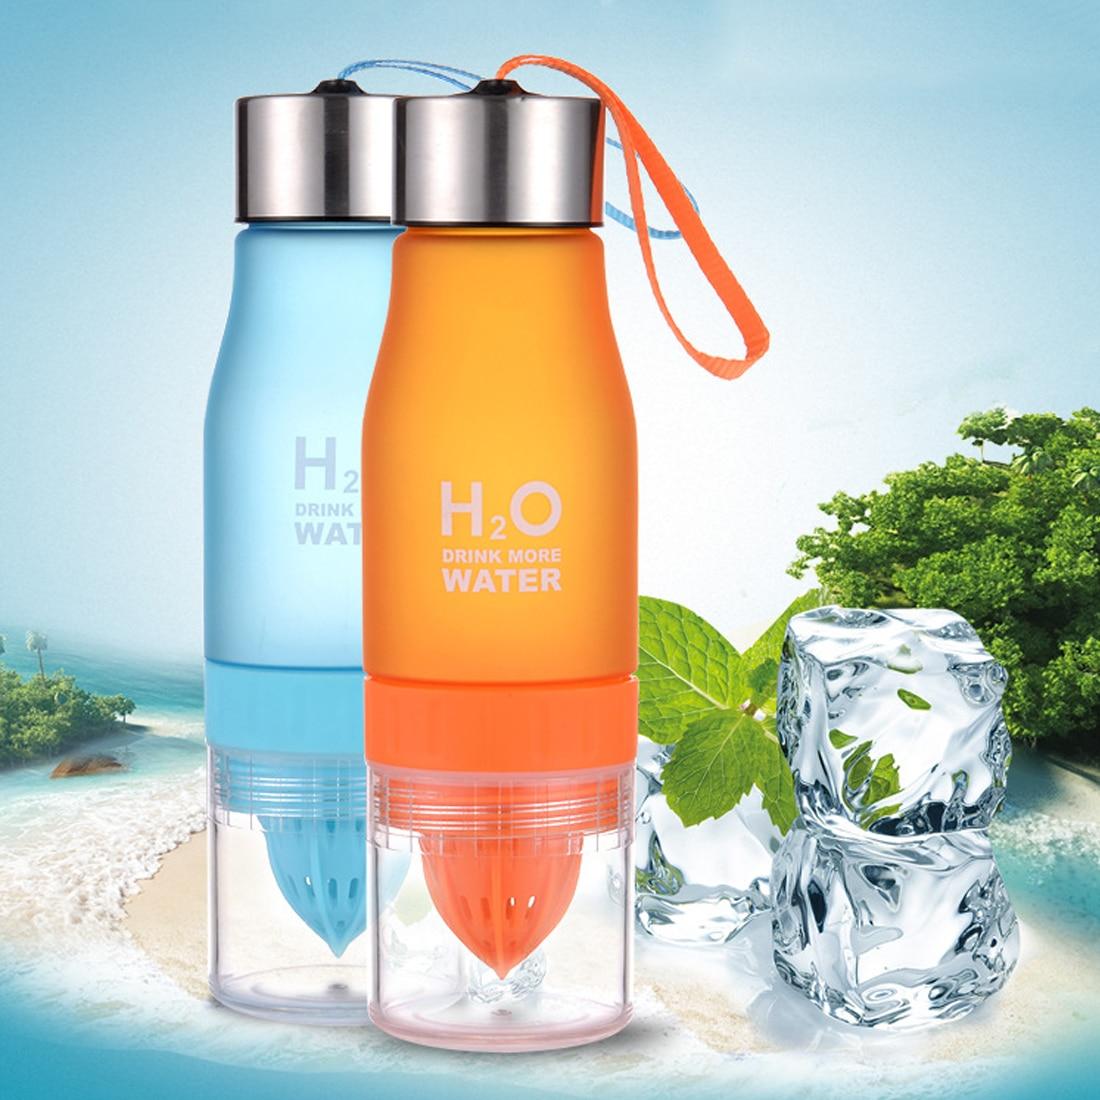 hot sale 700ml Water Bottle H20 plastic Fruit infusion bottle Infuser Drink Outdoor Sports Juice lemon Portable Water